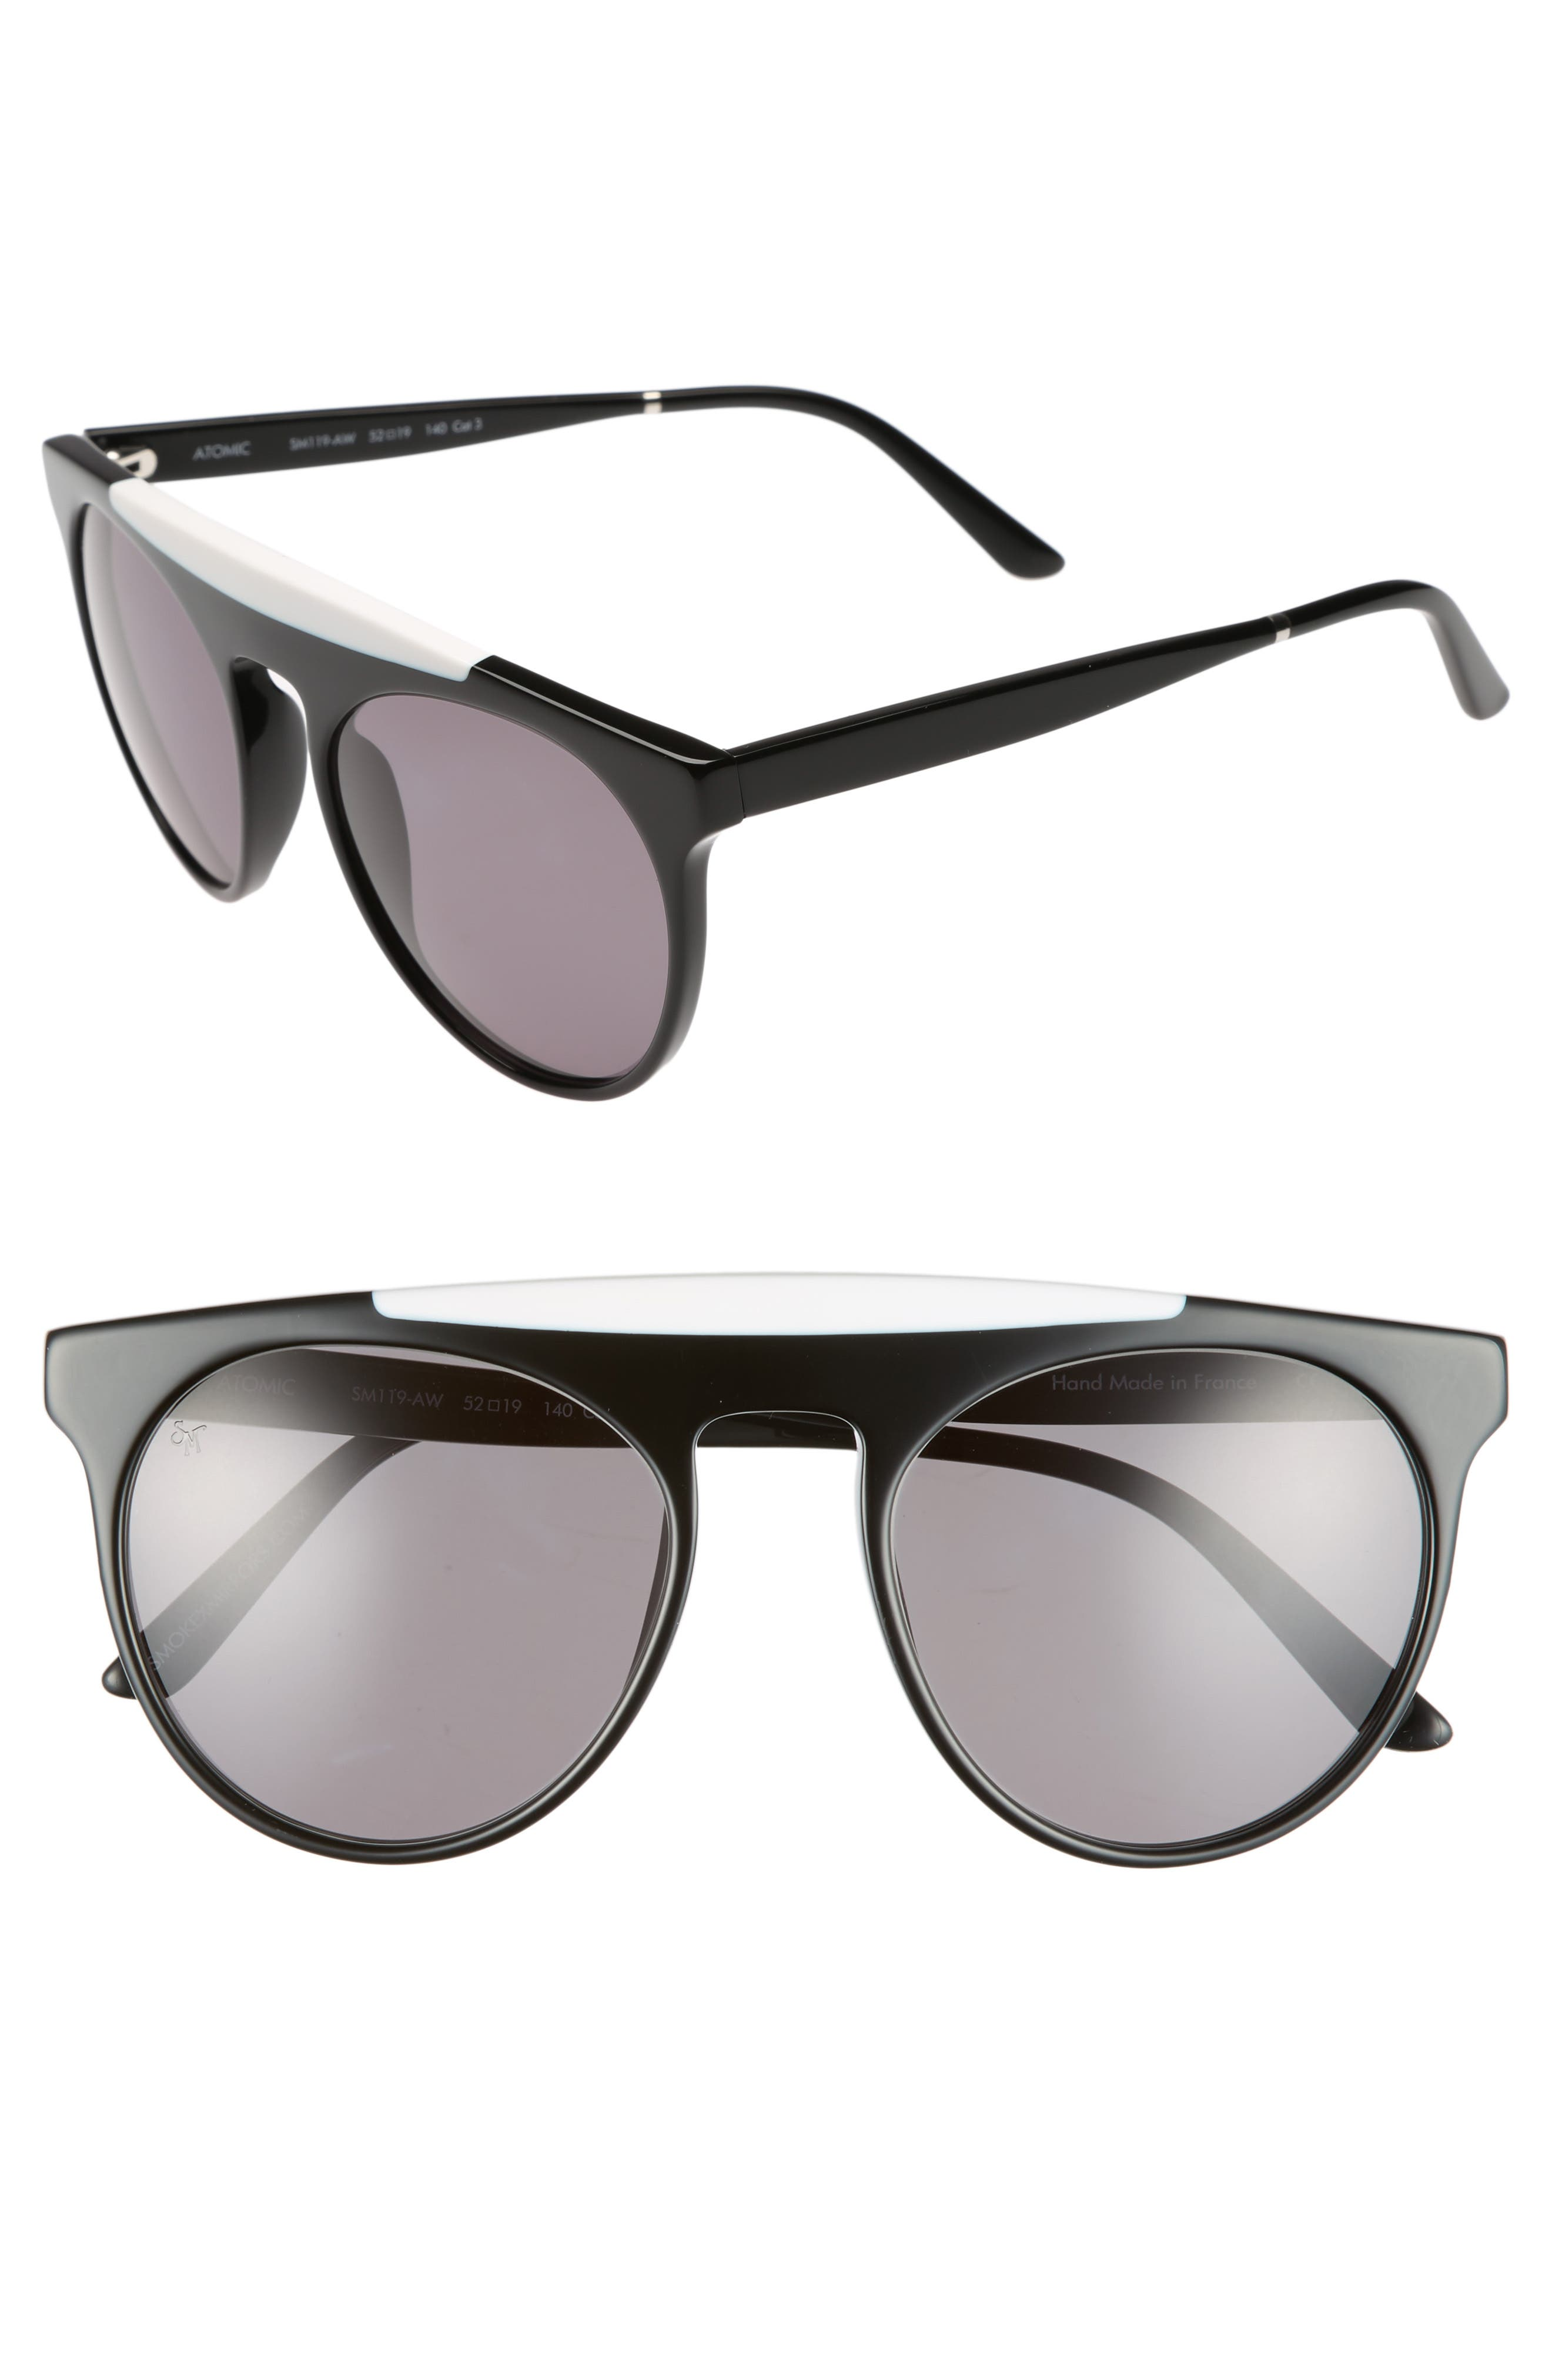 Atomic 52mm Sunglasses,                         Main,                         color,